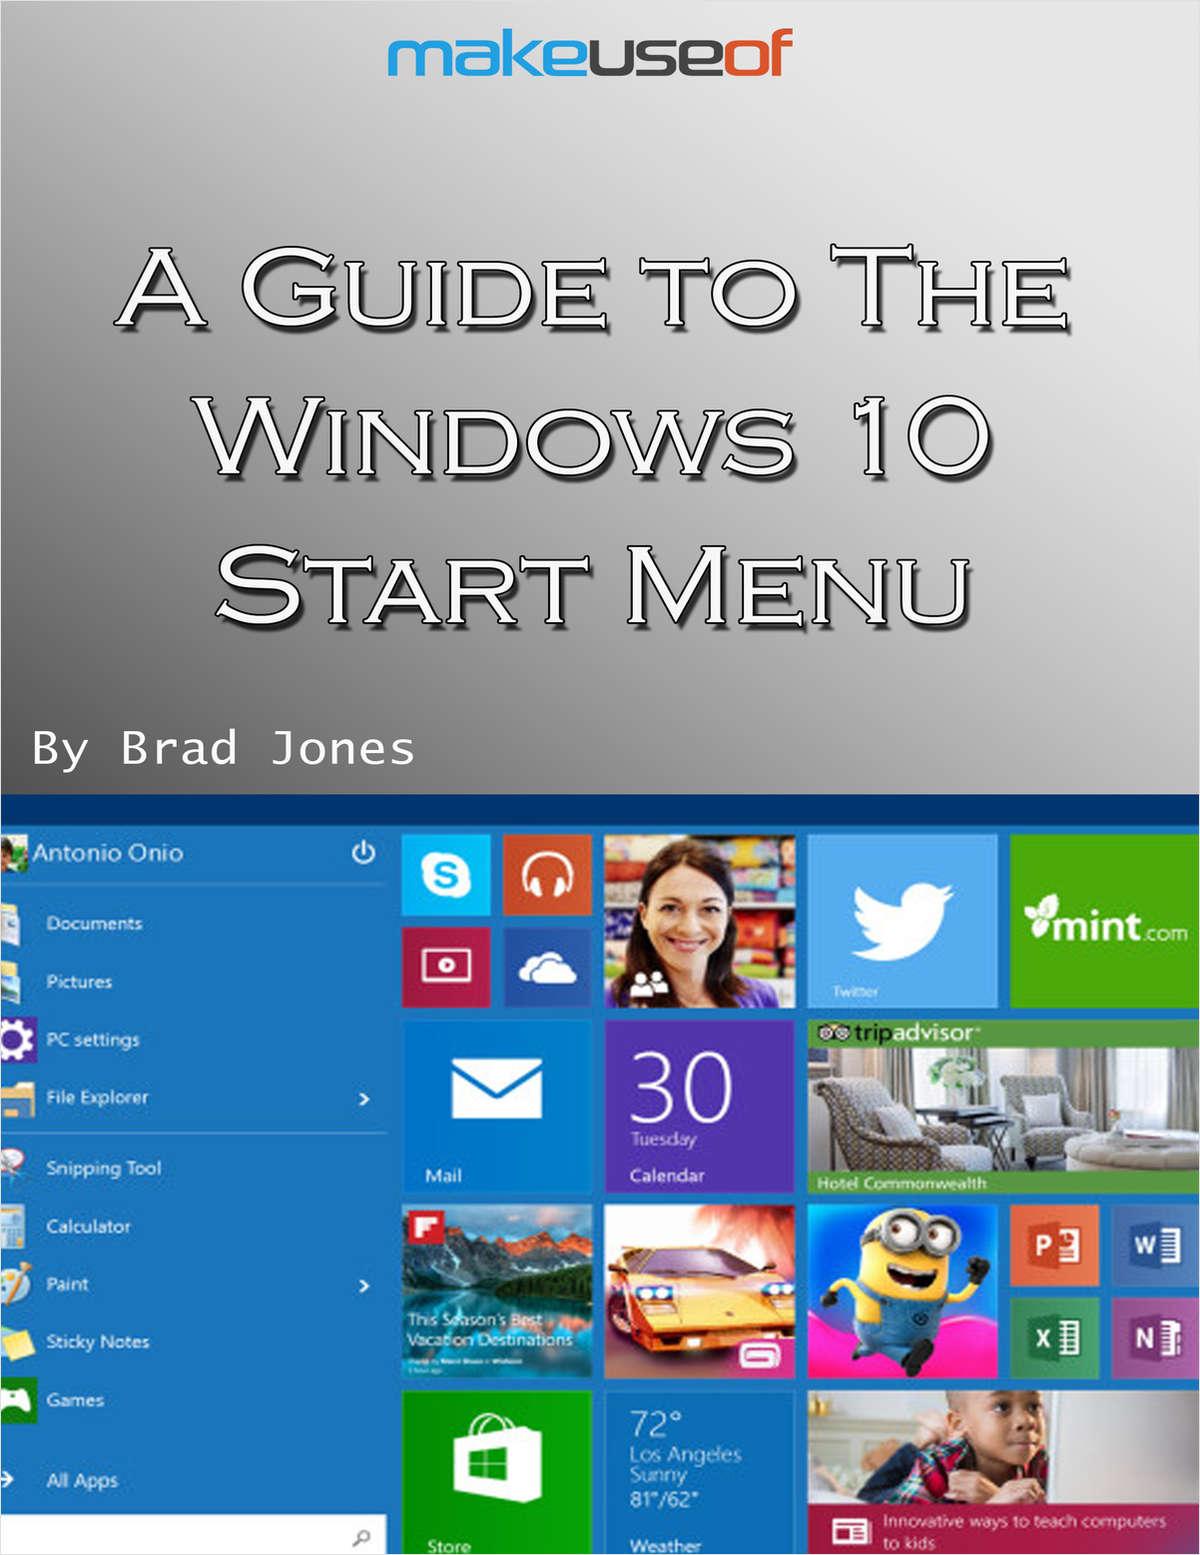 A Guide to the Windows 10 Start Menu